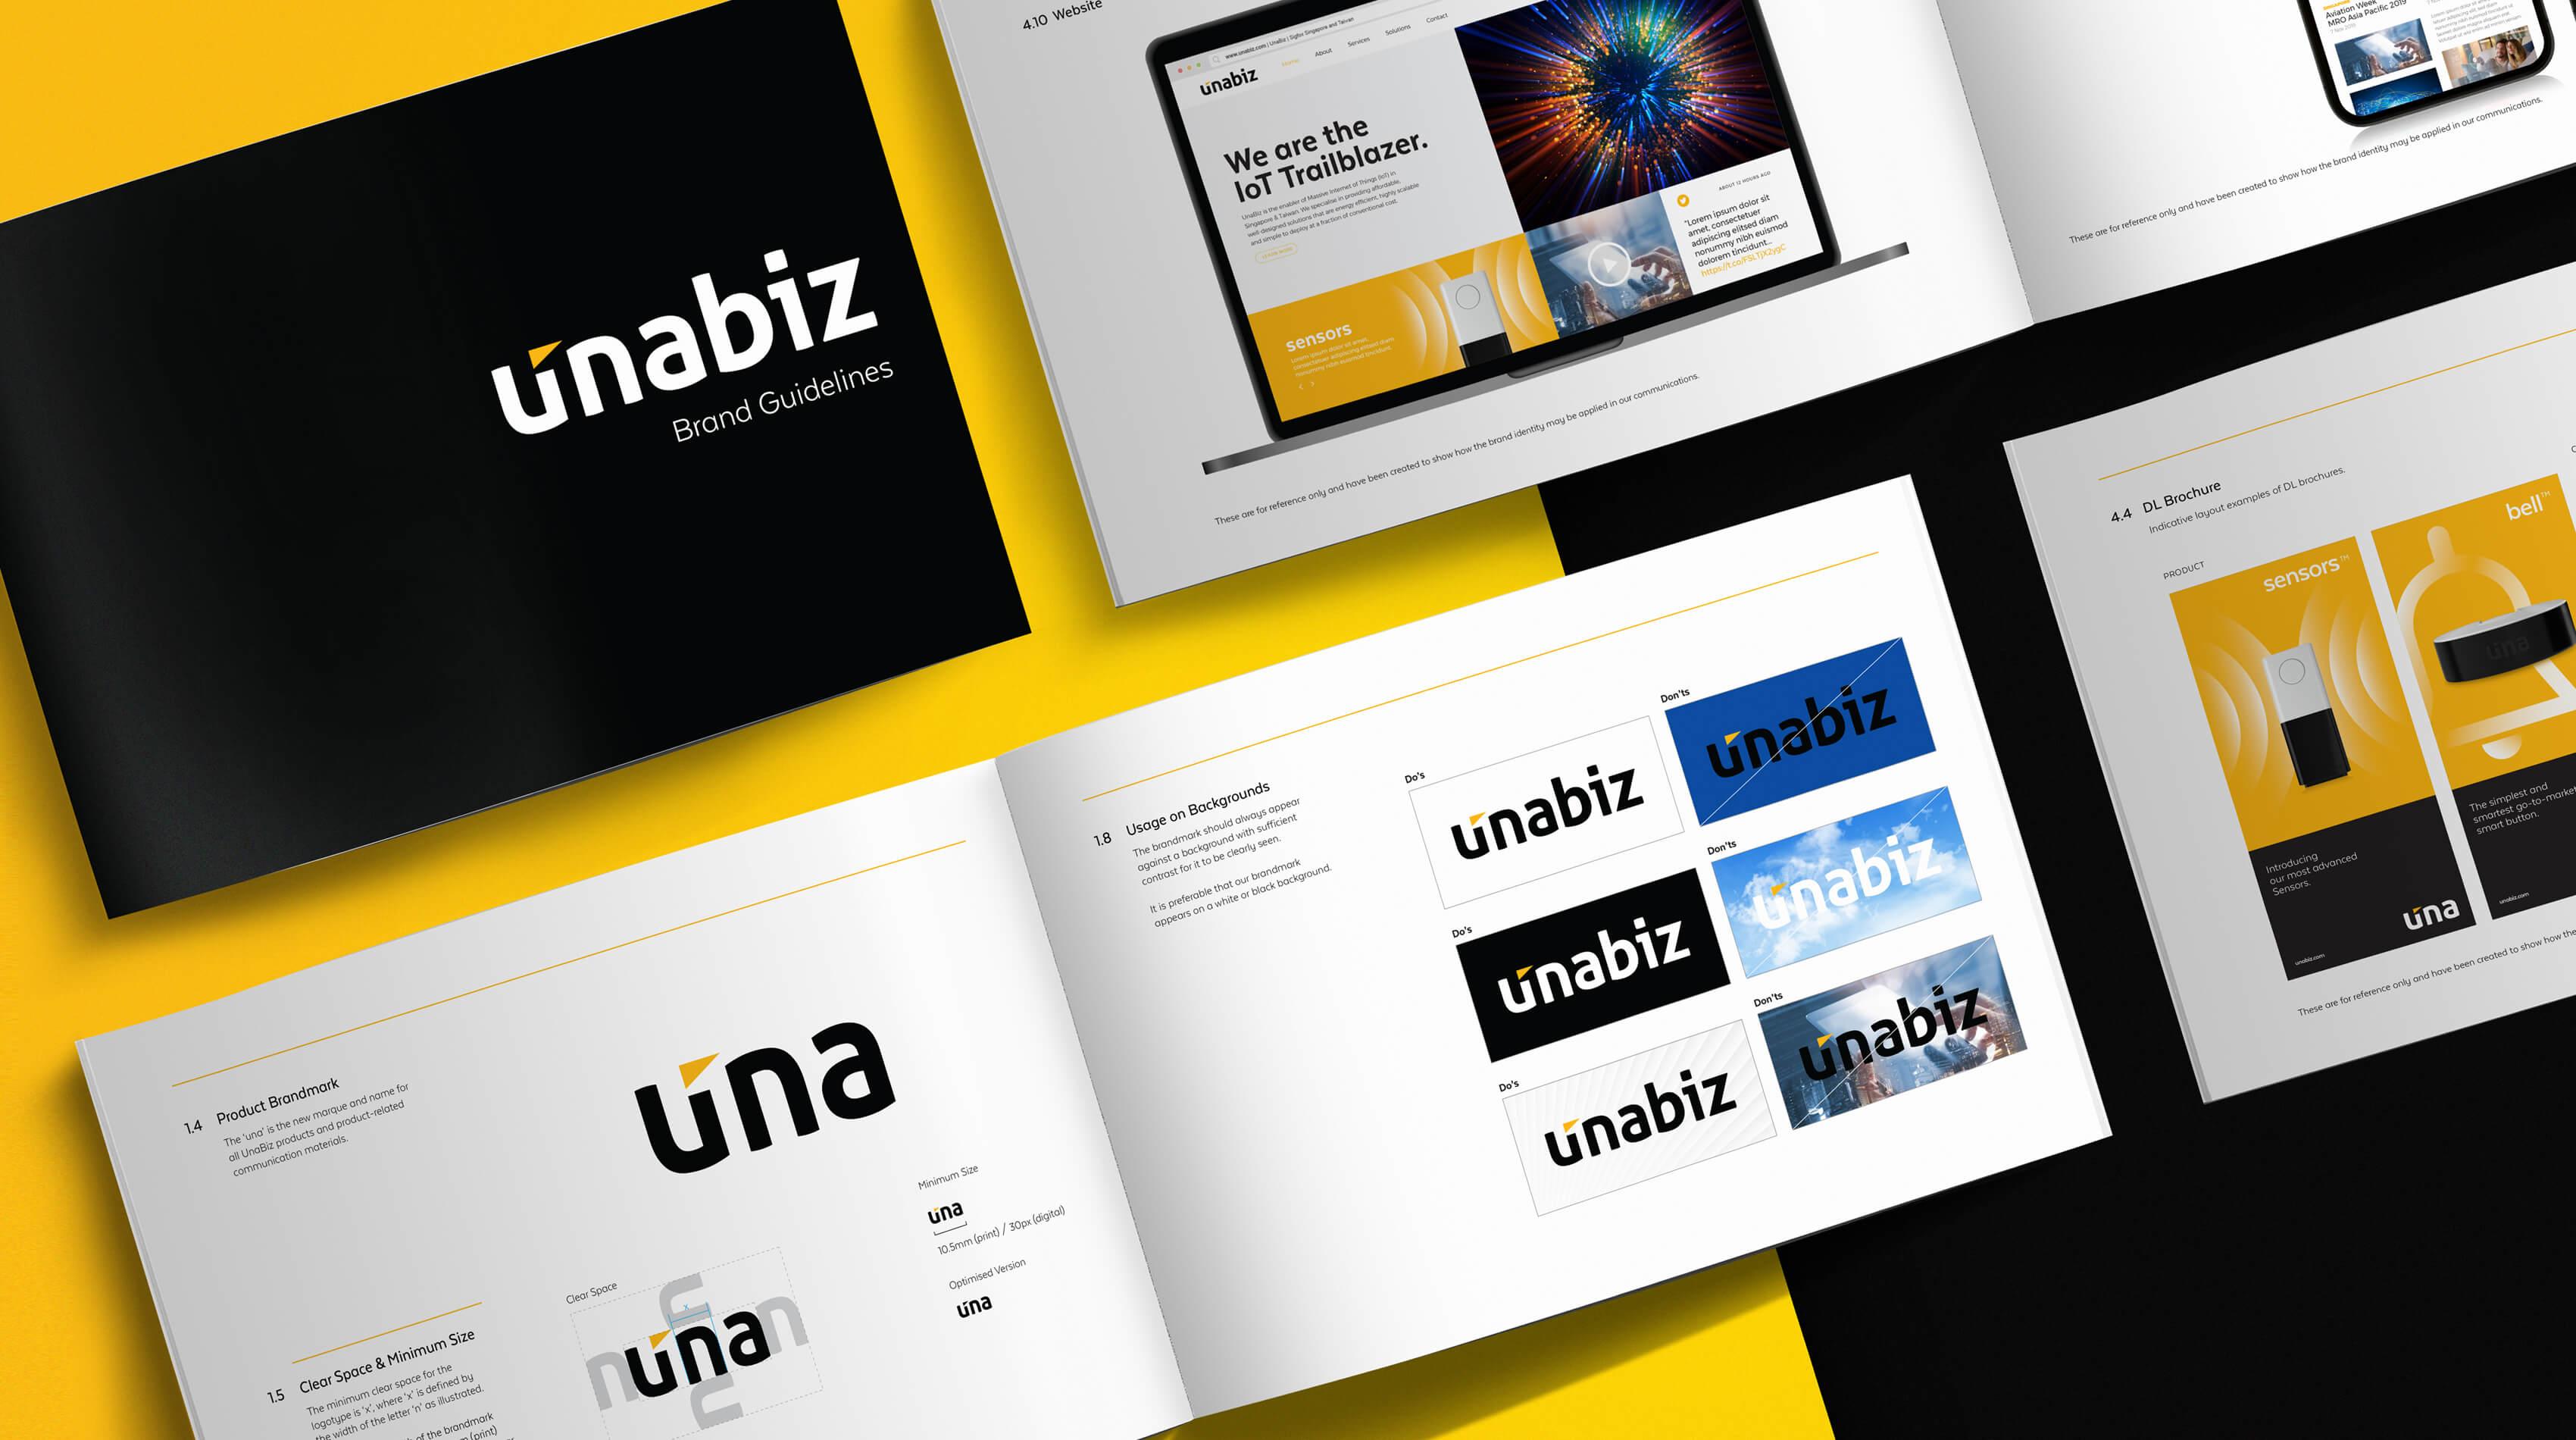 https://bonseydesign.com/wp-content/uploads/2020/08/Unabiz-WEB-page-3.jpg